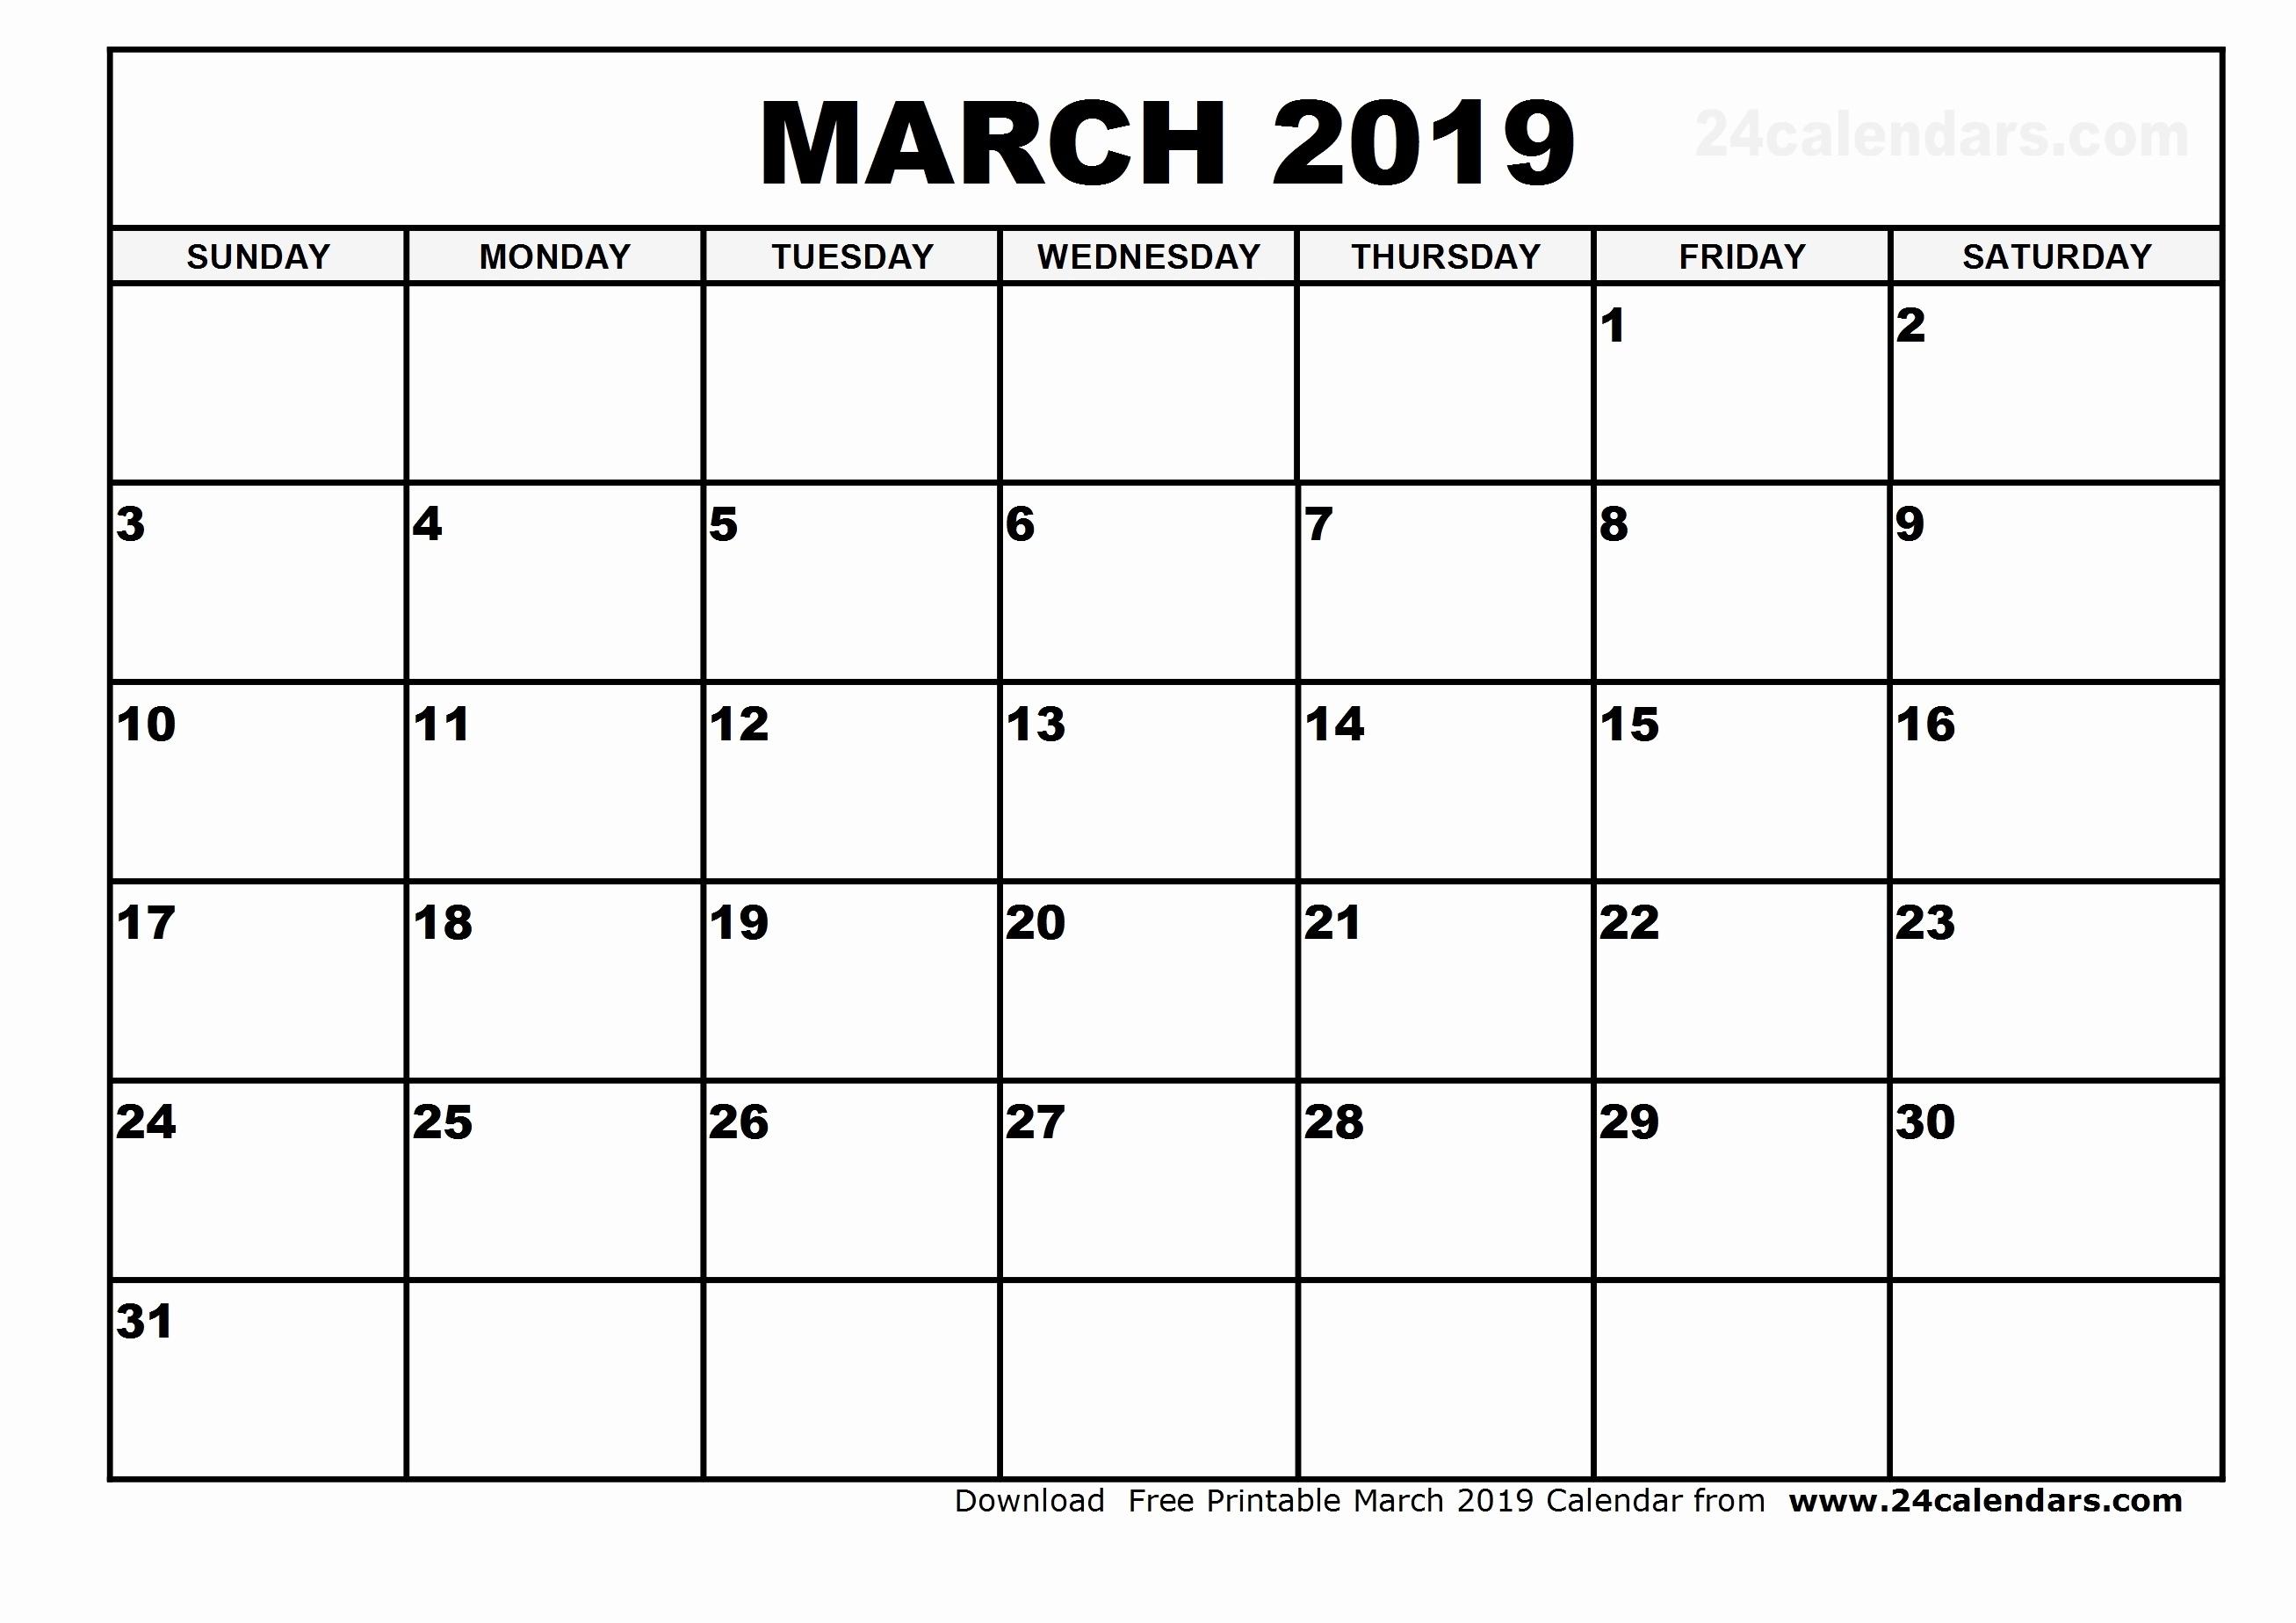 Free Printable Calendar 4 Month • Printable Blank Calendar Template for Free Printable Month By Month Calendars